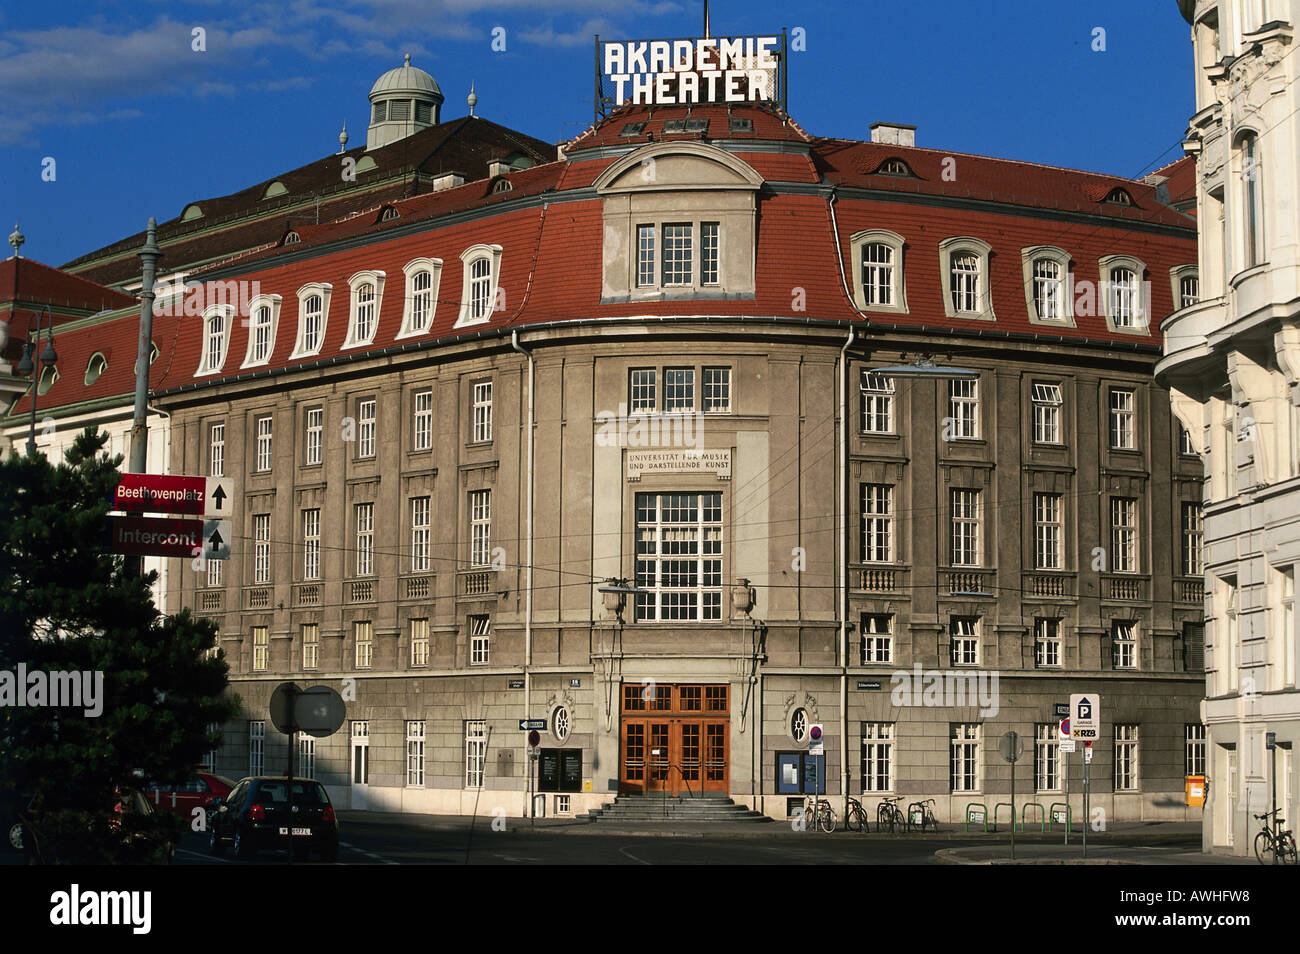 Austria  Vienna  Akademietheater  fa ade of Academy Theater  plans by Ludwig Baumann  Ferdinand Fellner and Hermann Helmer. Austria  Vienna  Akademietheater  Fa ade Of Academy Theater  Plans